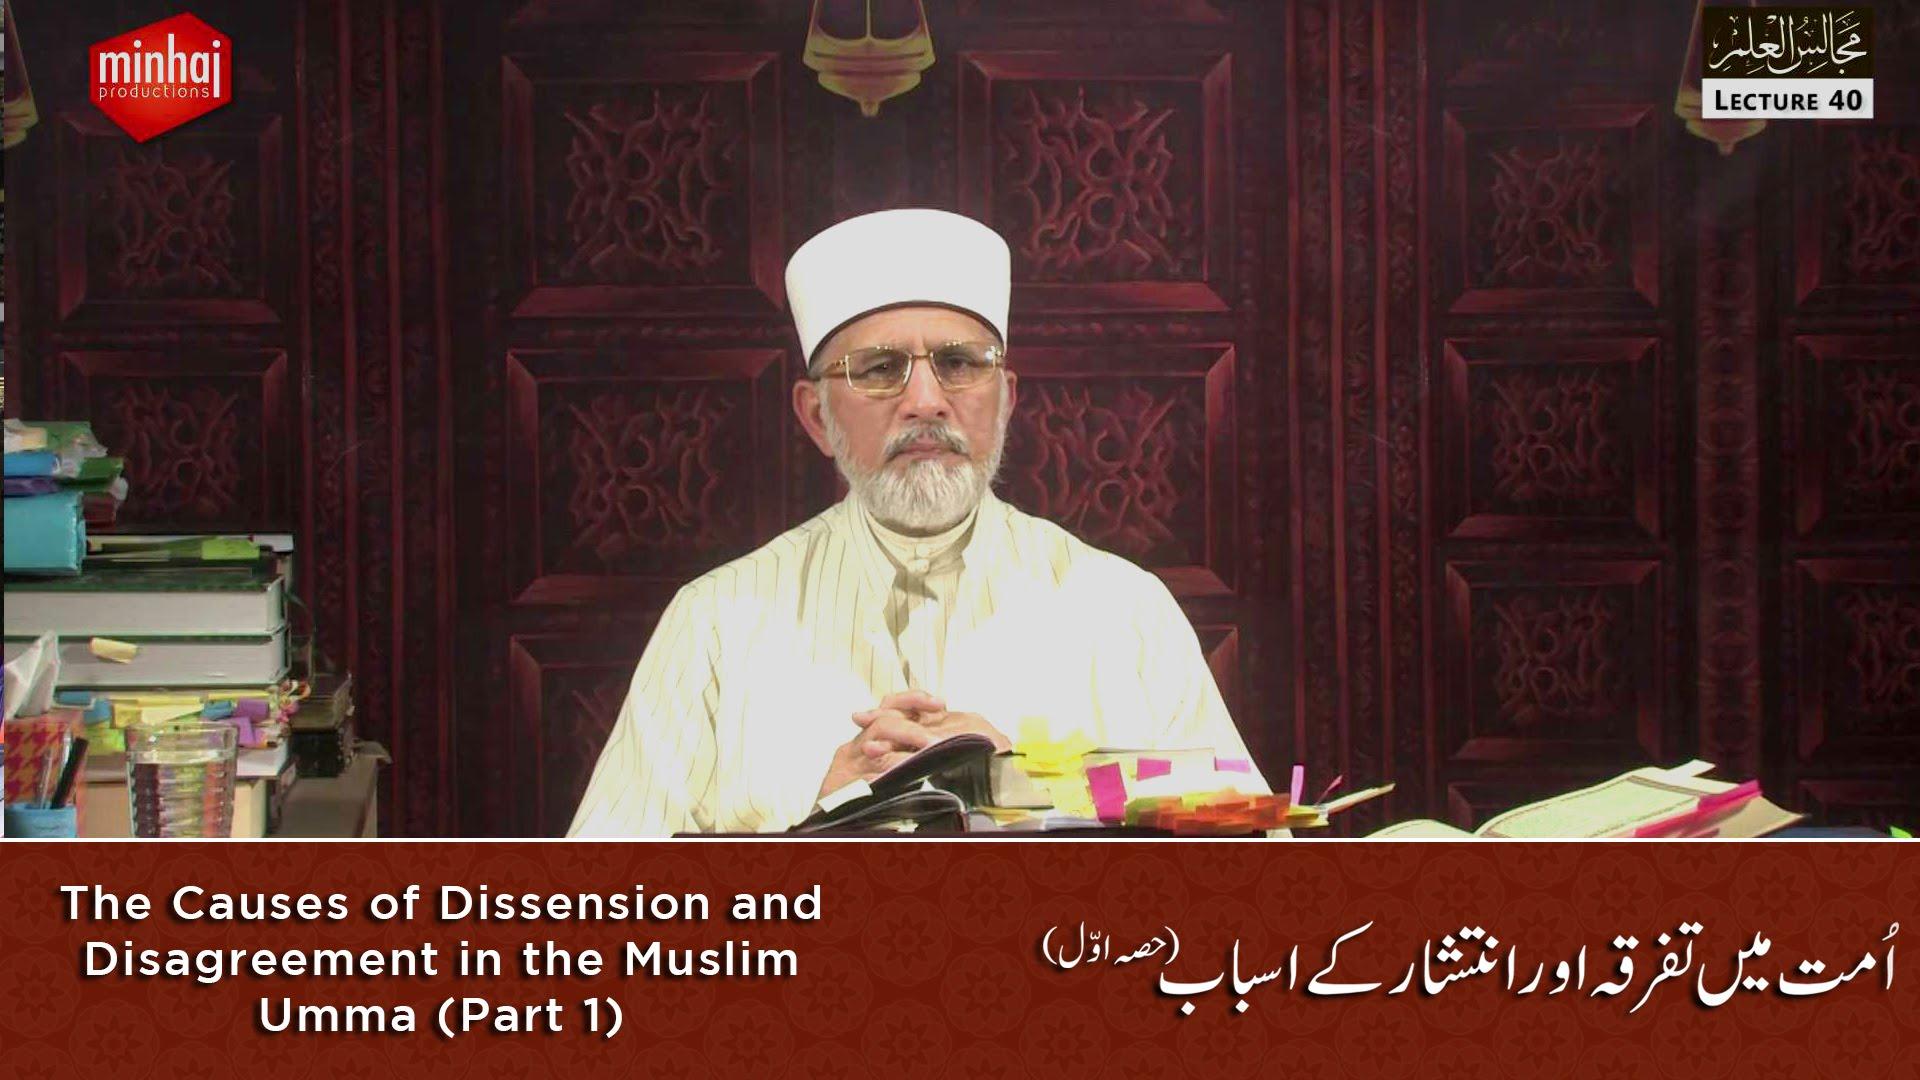 Majalis-ul-ilm (Lecture 40) - by Shaykh-ul-Islam Dr Muhammad Tahir-ul-Qadri